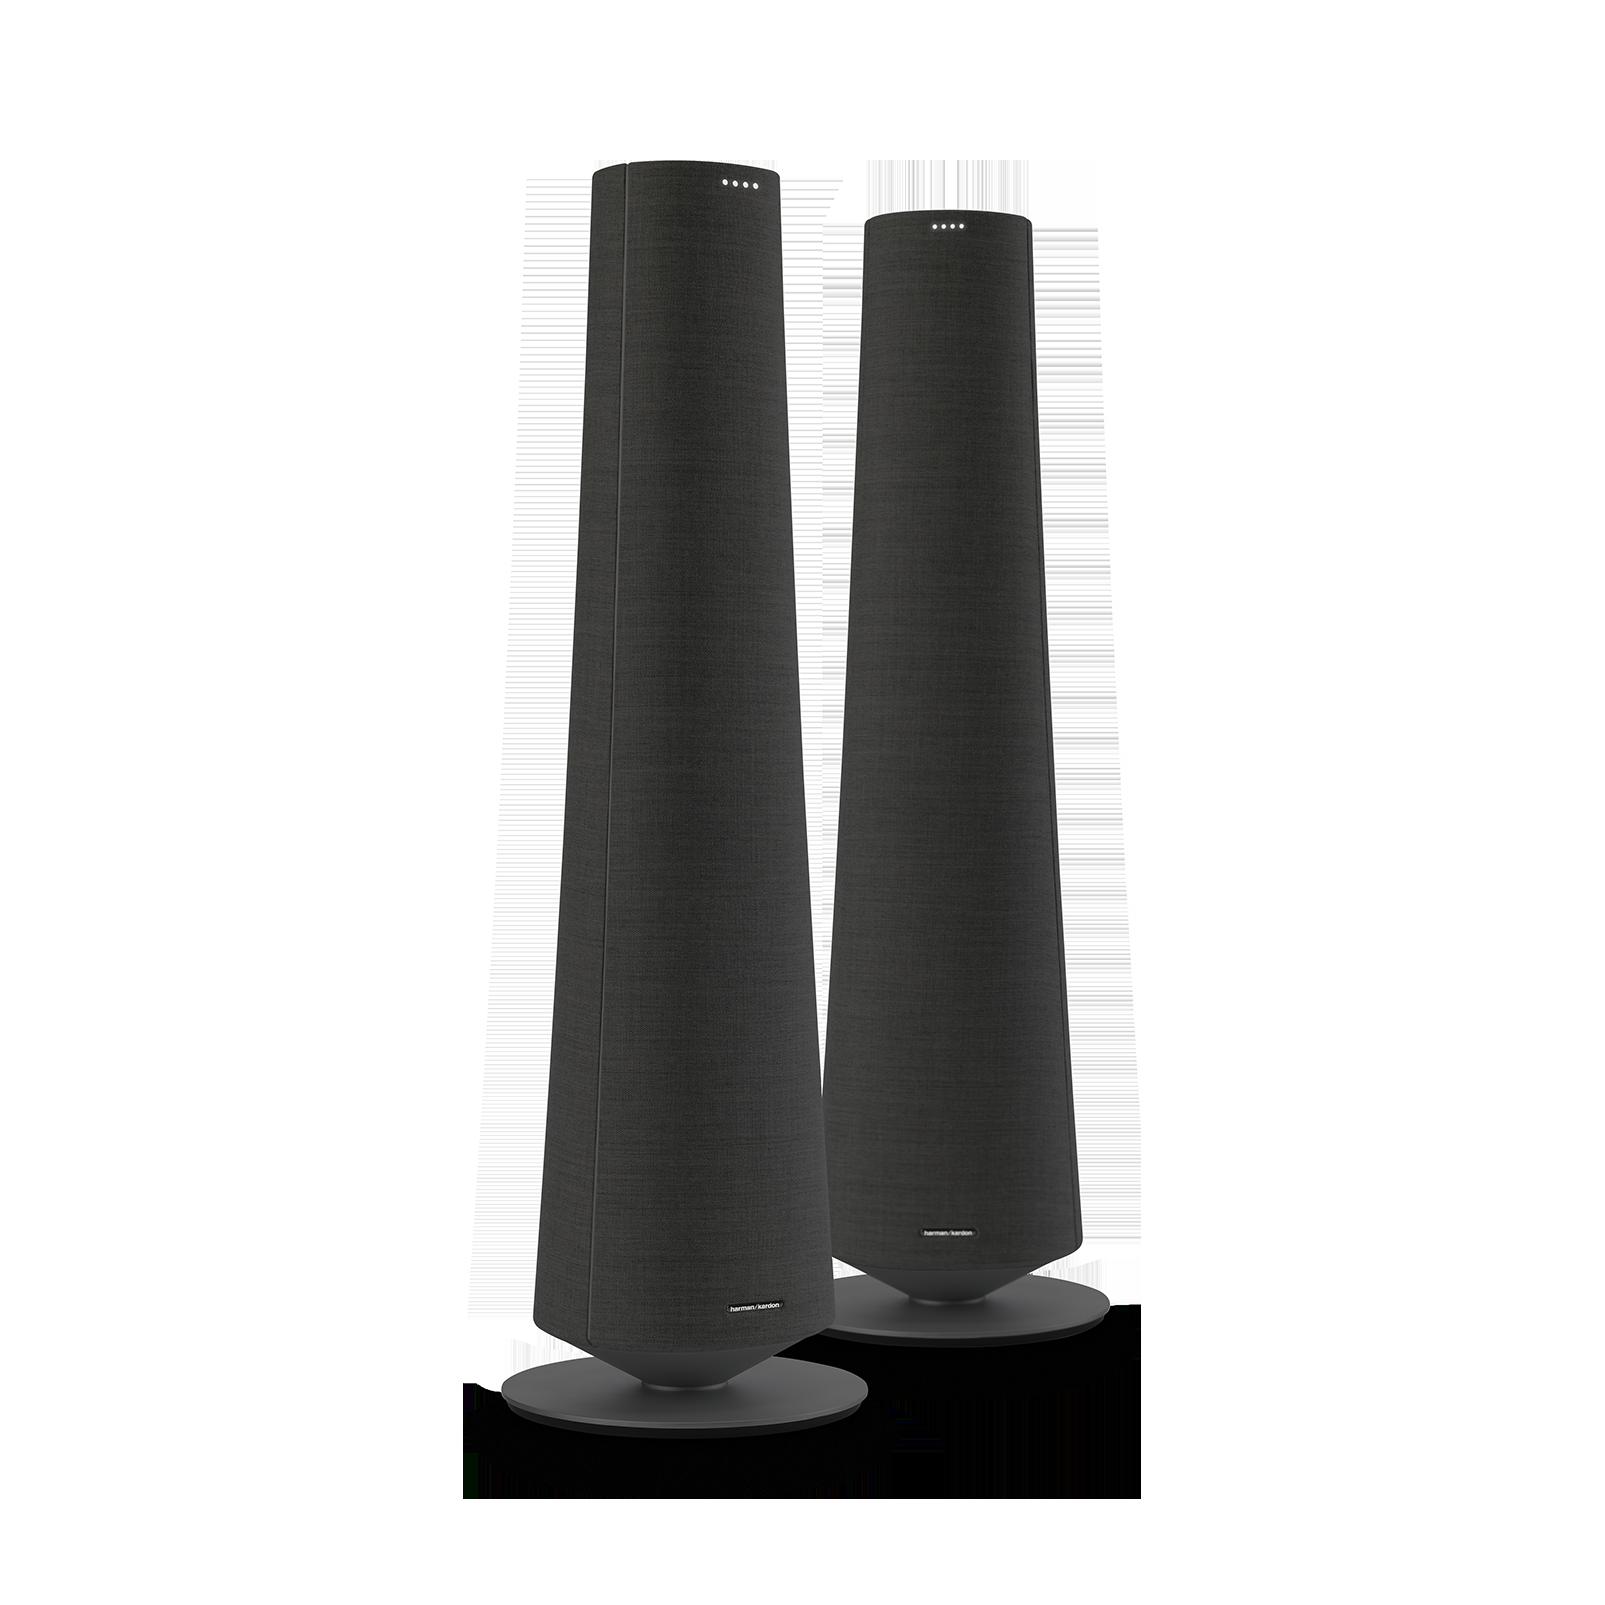 Harman Kardon Citation Tower - Black - Smart Premium Floorstanding Speaker that delivers an impactful performance - Hero